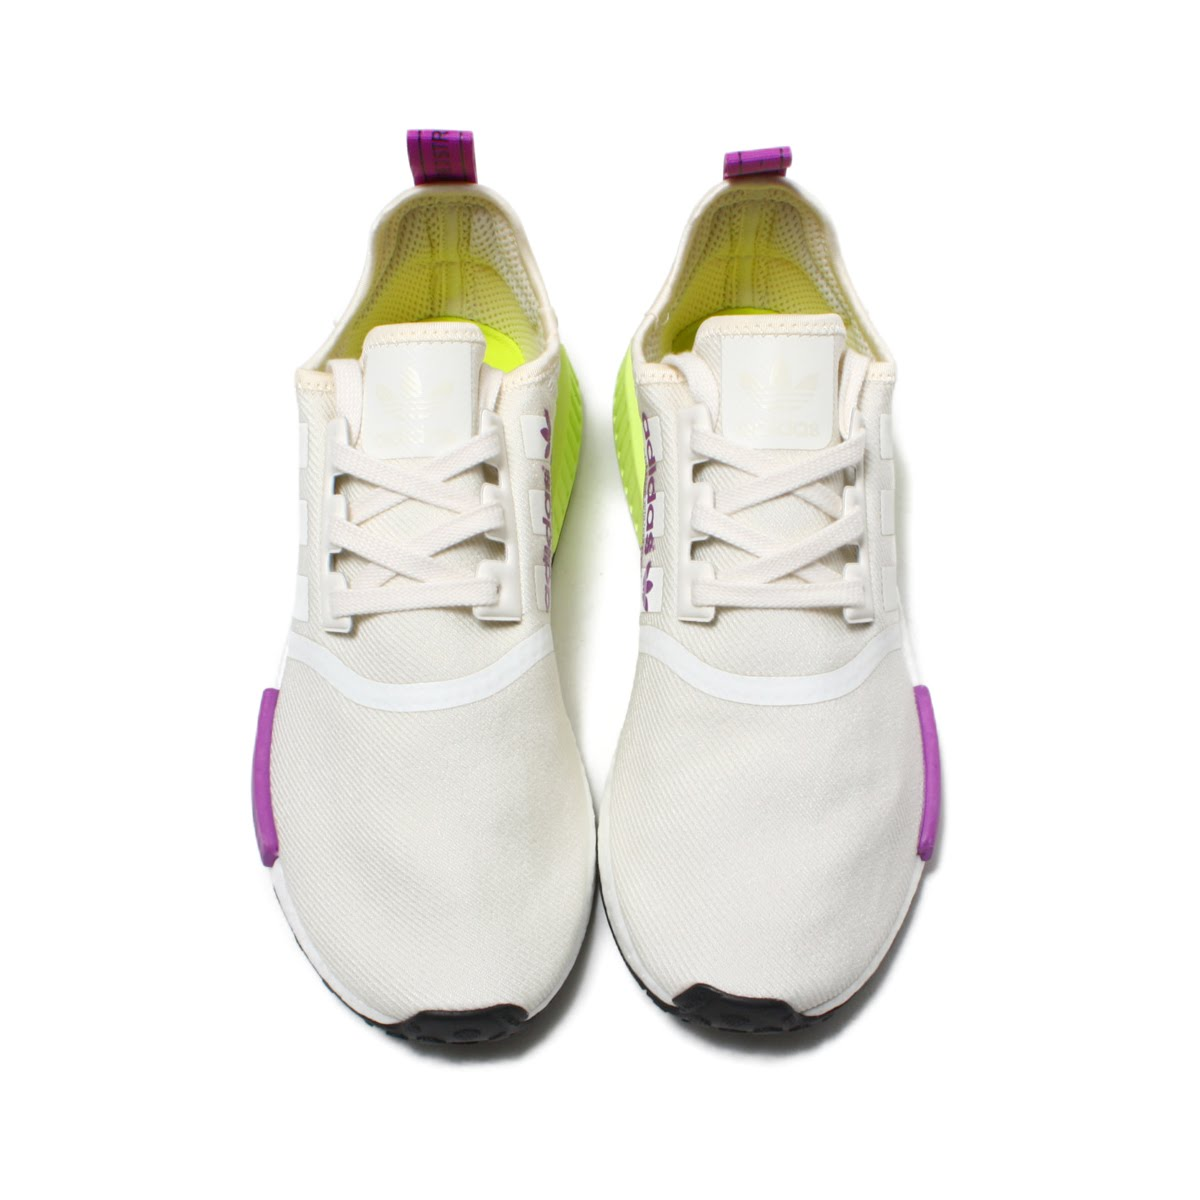 2ec859d87 adidas NMD R1 (Adidas N M D R1) chalk white   chalk white   semi-solar  yellow 18FW-I